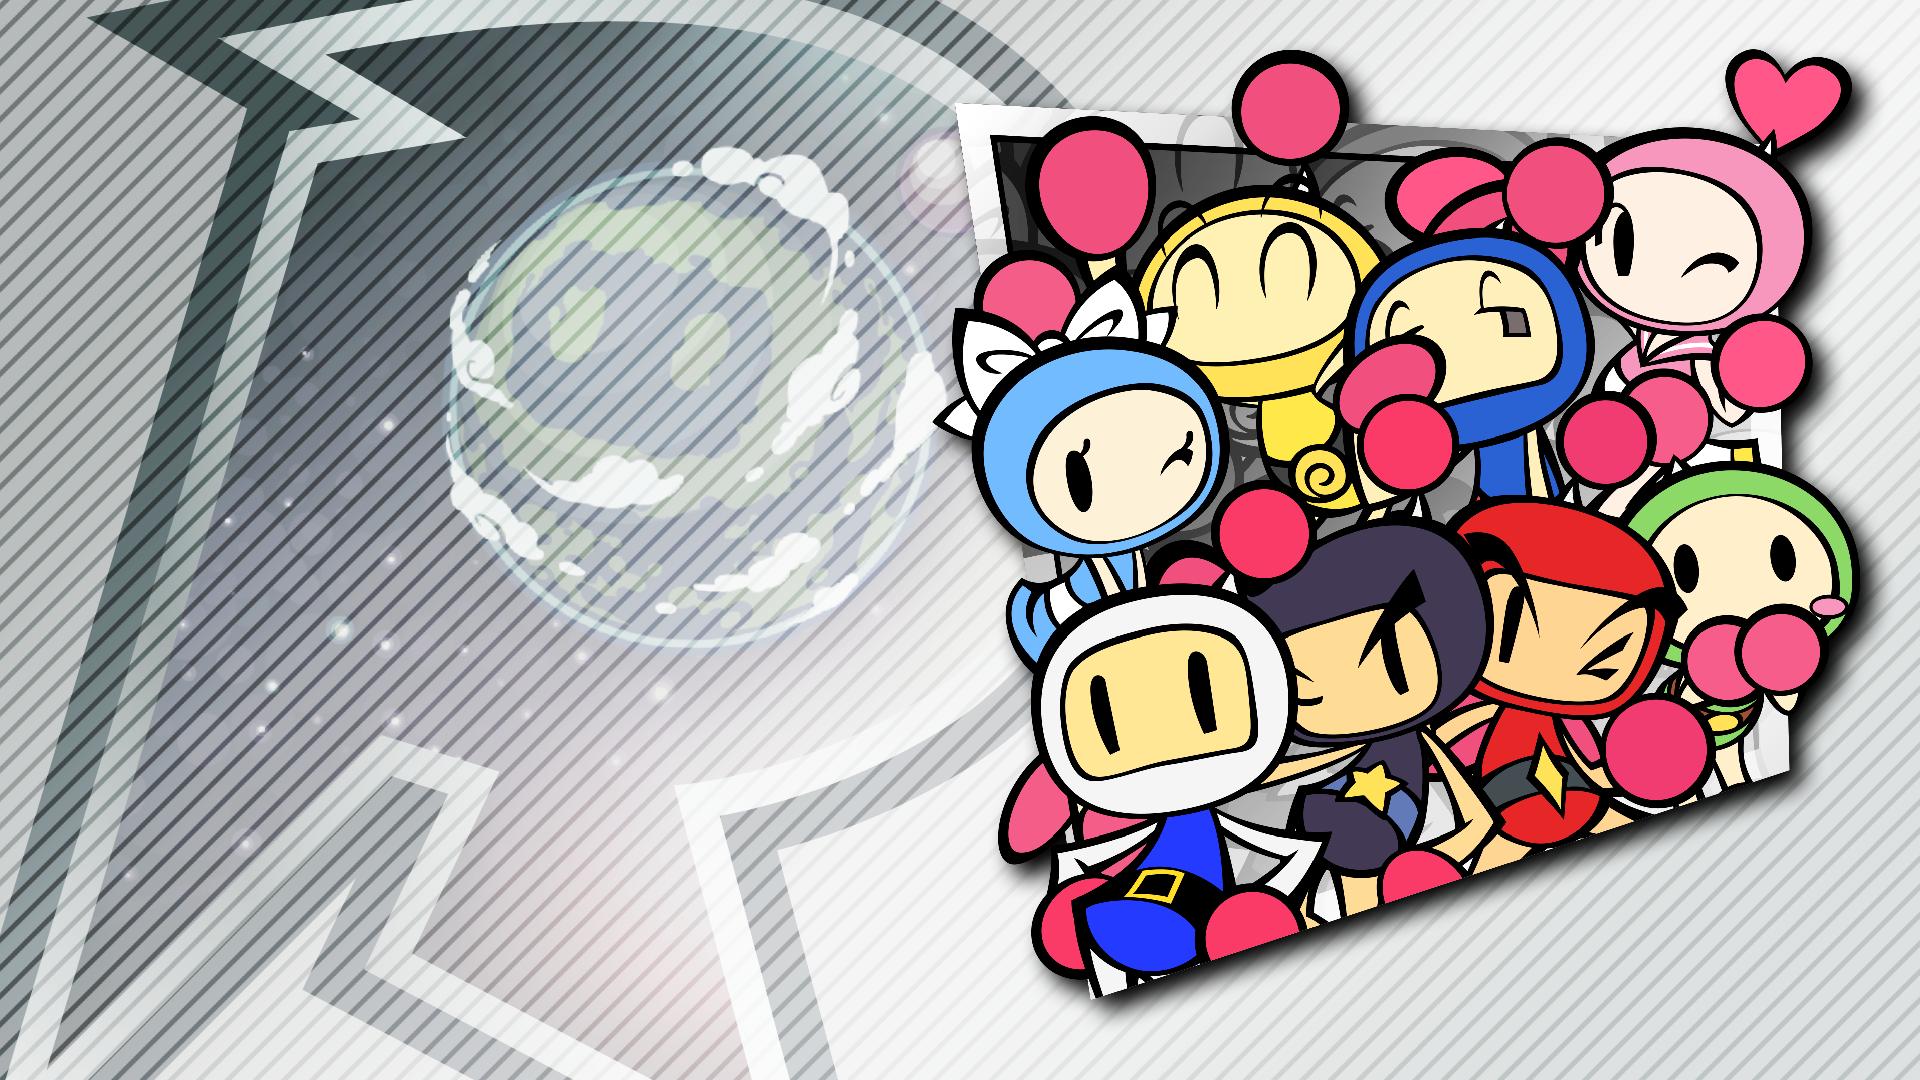 The Eight Bomberman Bros.